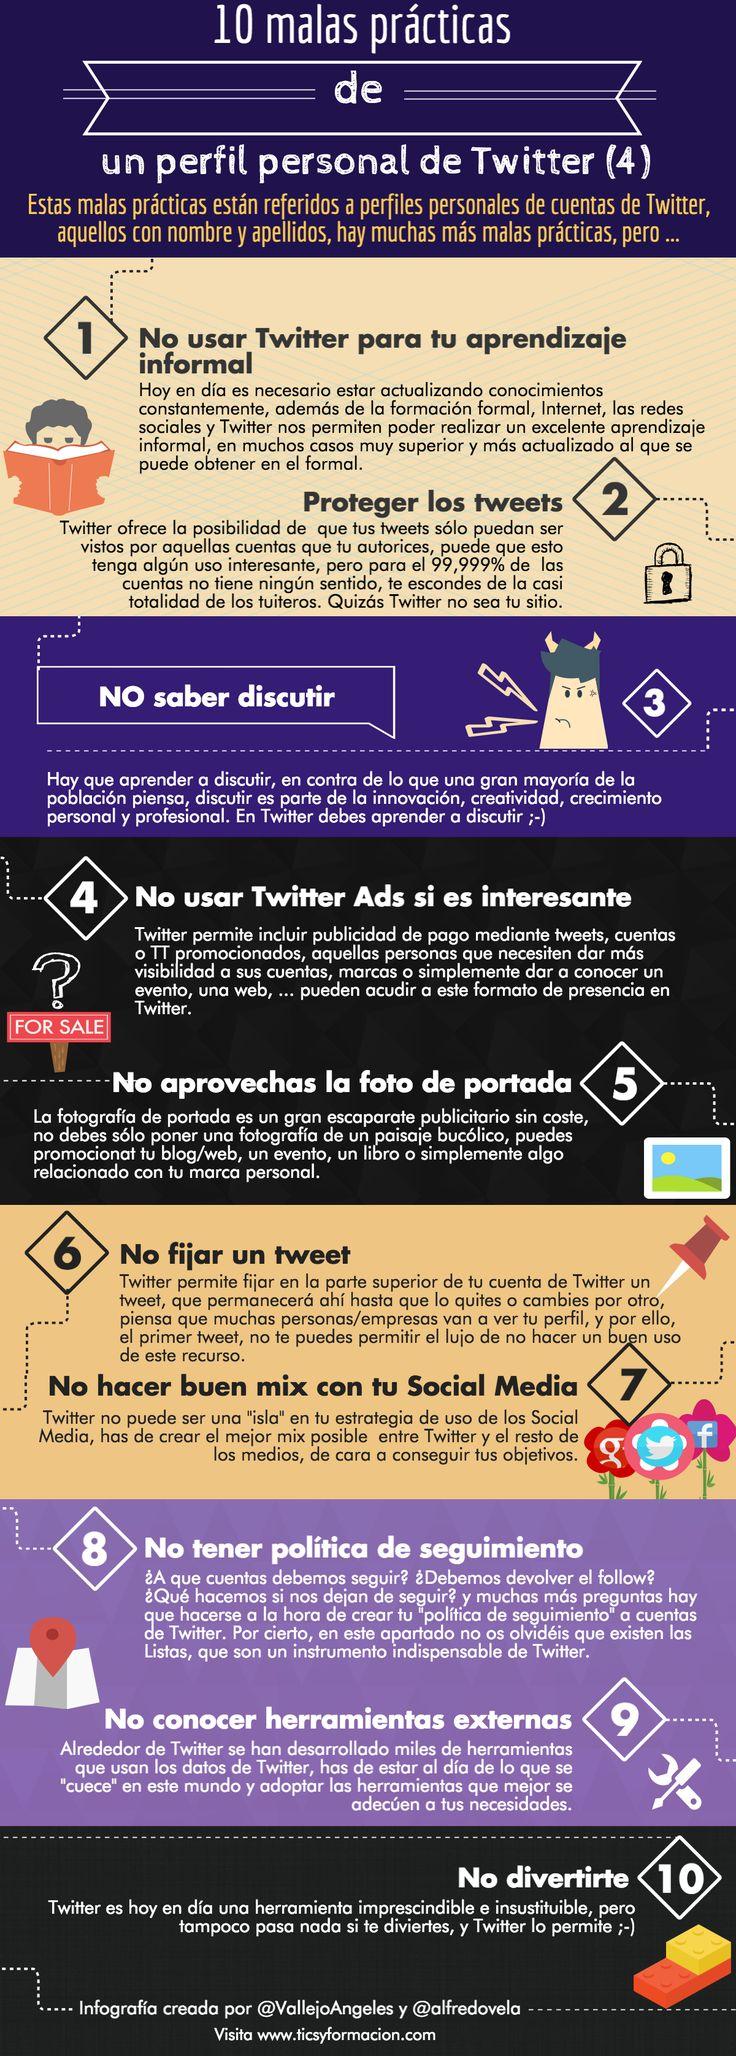 10 malas prácticas de un perfil personal de Twitter (IV).